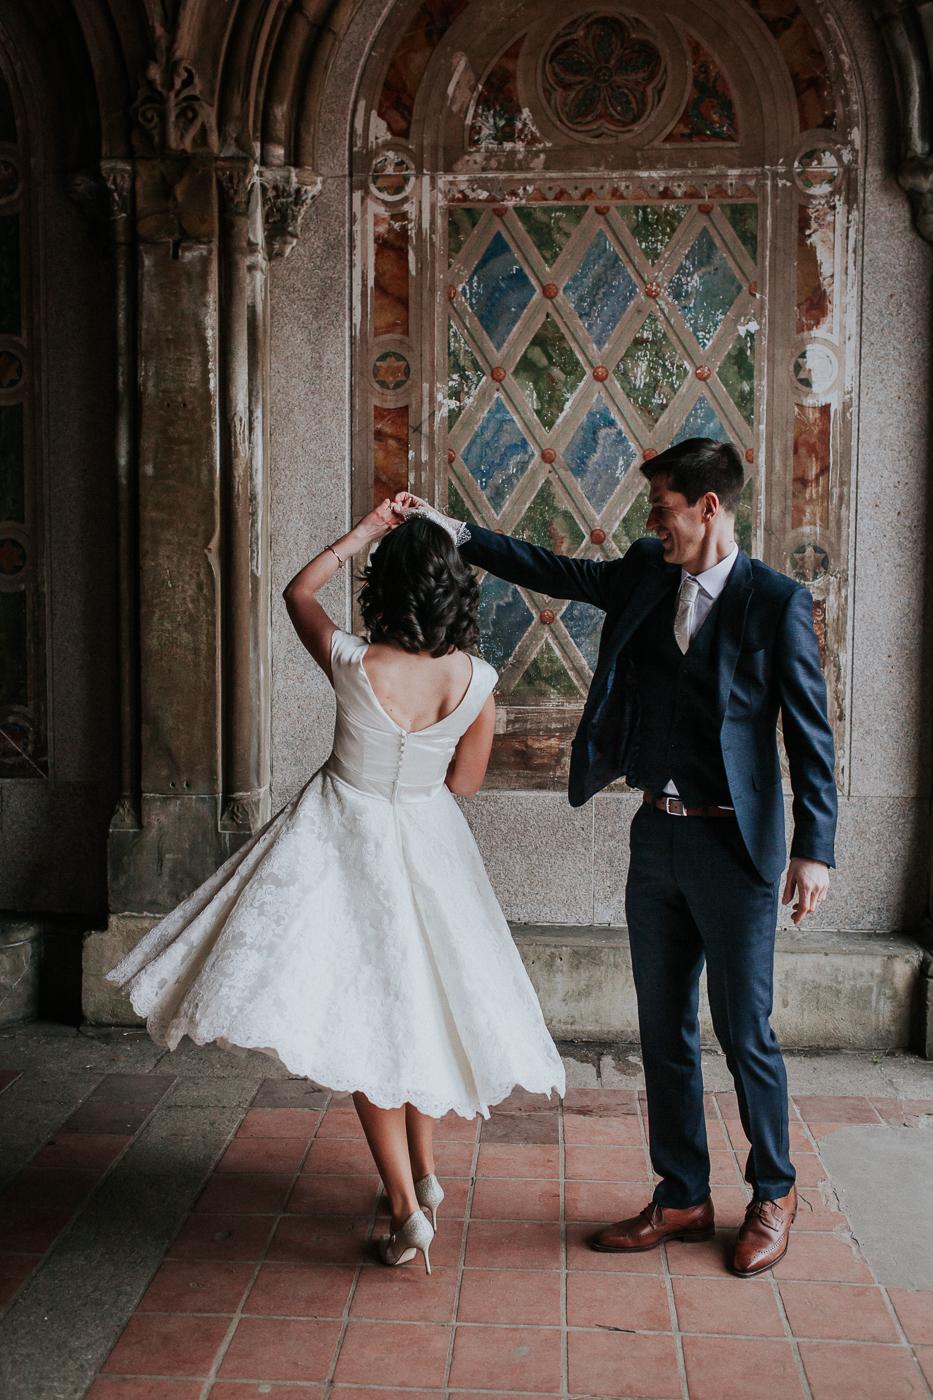 Ladies-Pavilion-Central-Park-NYC-Documentary-Elopement-Wedding-Photographer-59.jpg